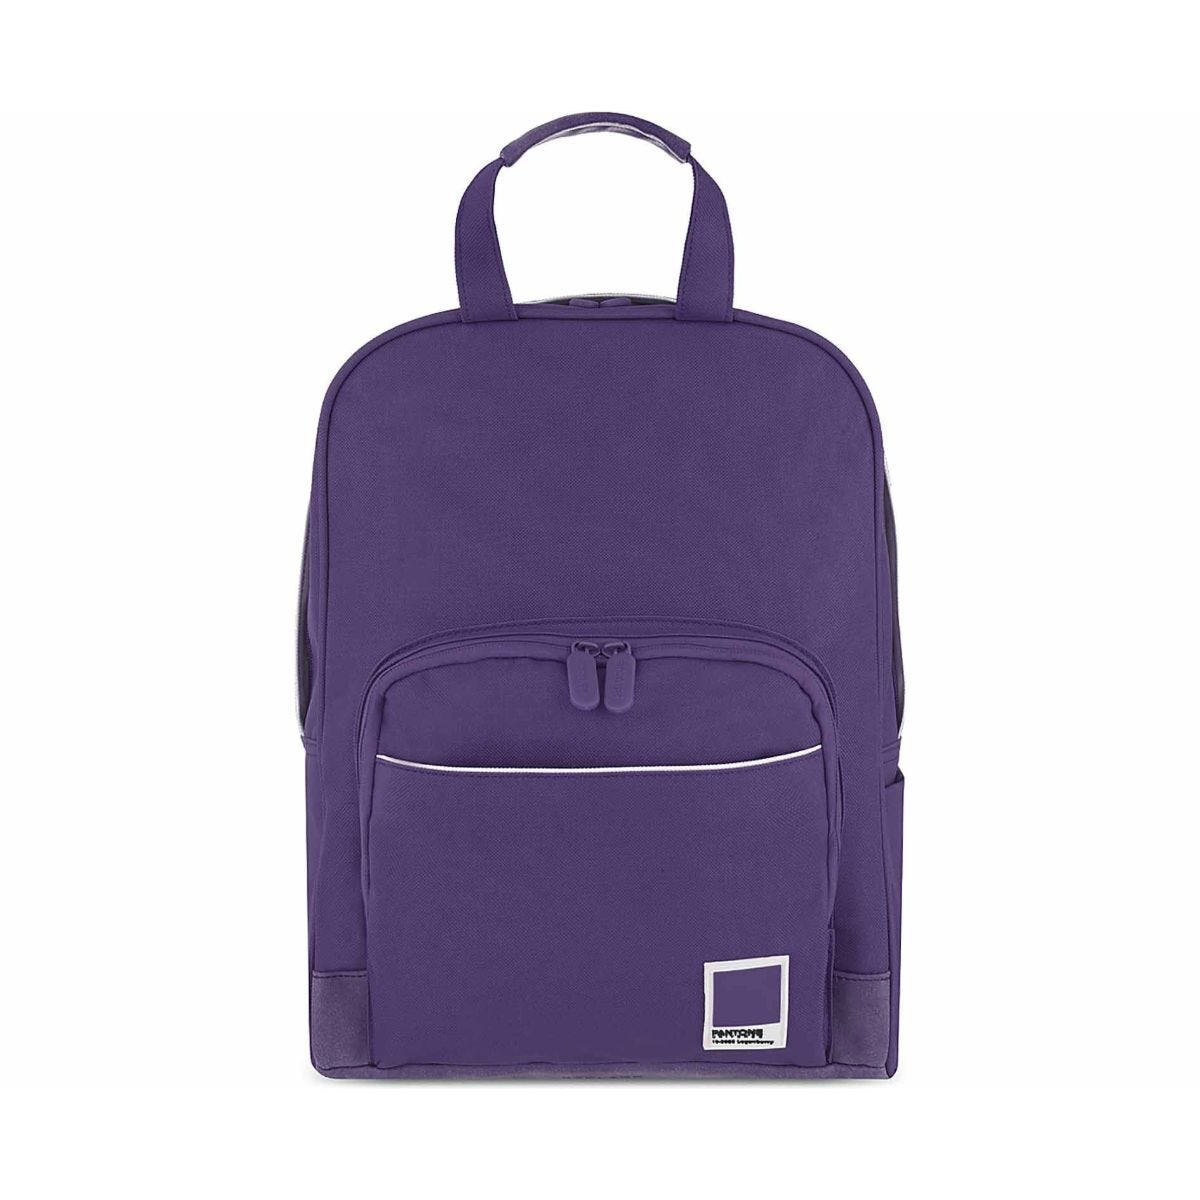 Pantone Laptop Backpack Medium Ultra Violet